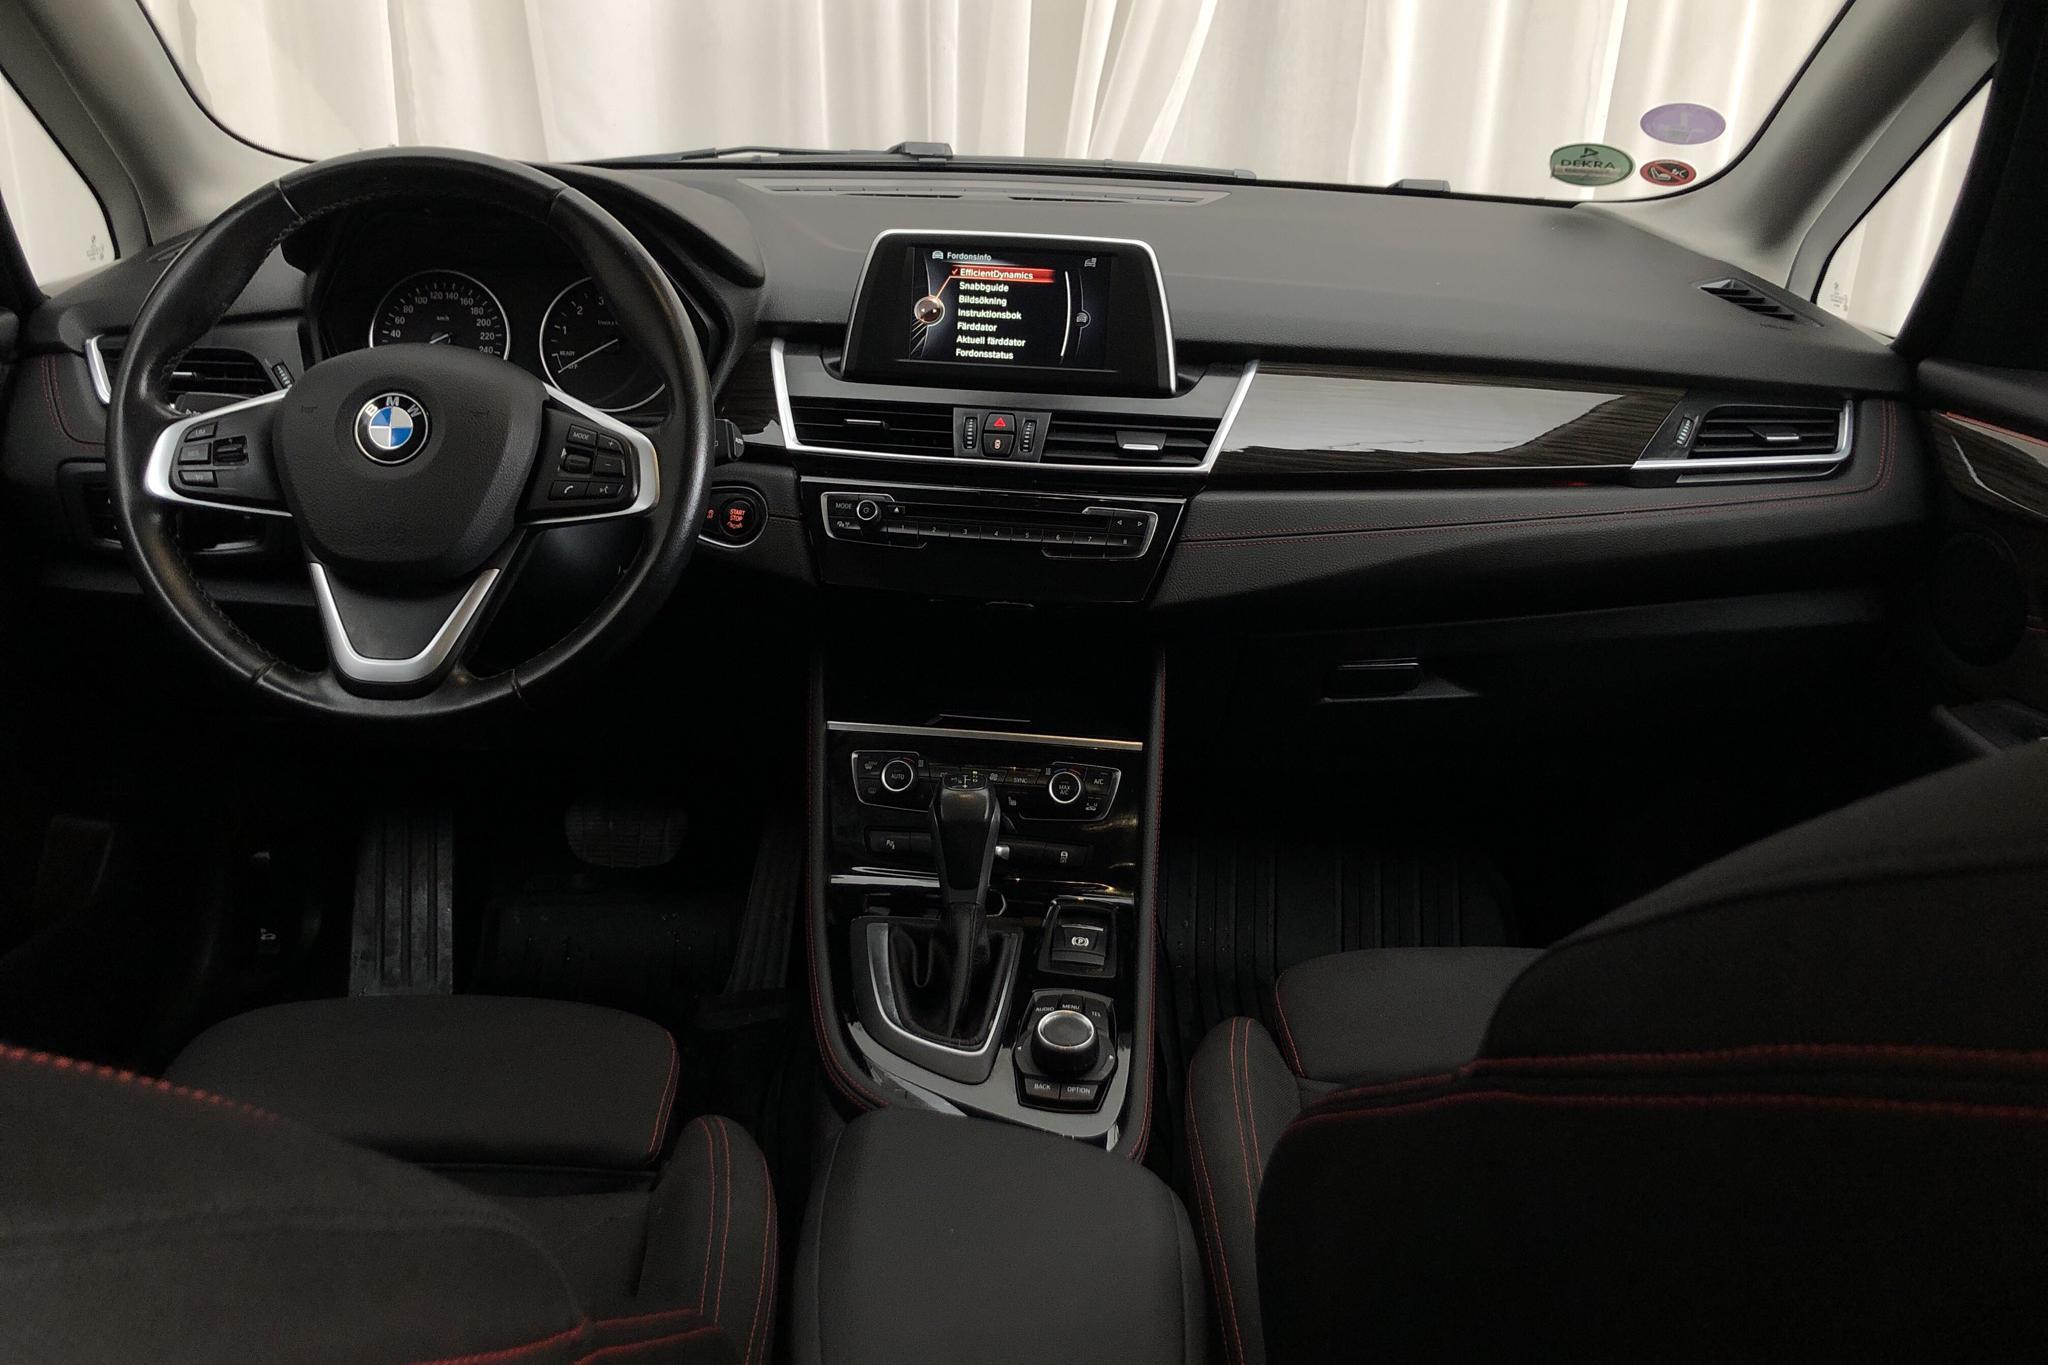 BMW 225i xDrive Active Tourer, F45 (231hk) - 11 476 mil - Automat - brun - 2015